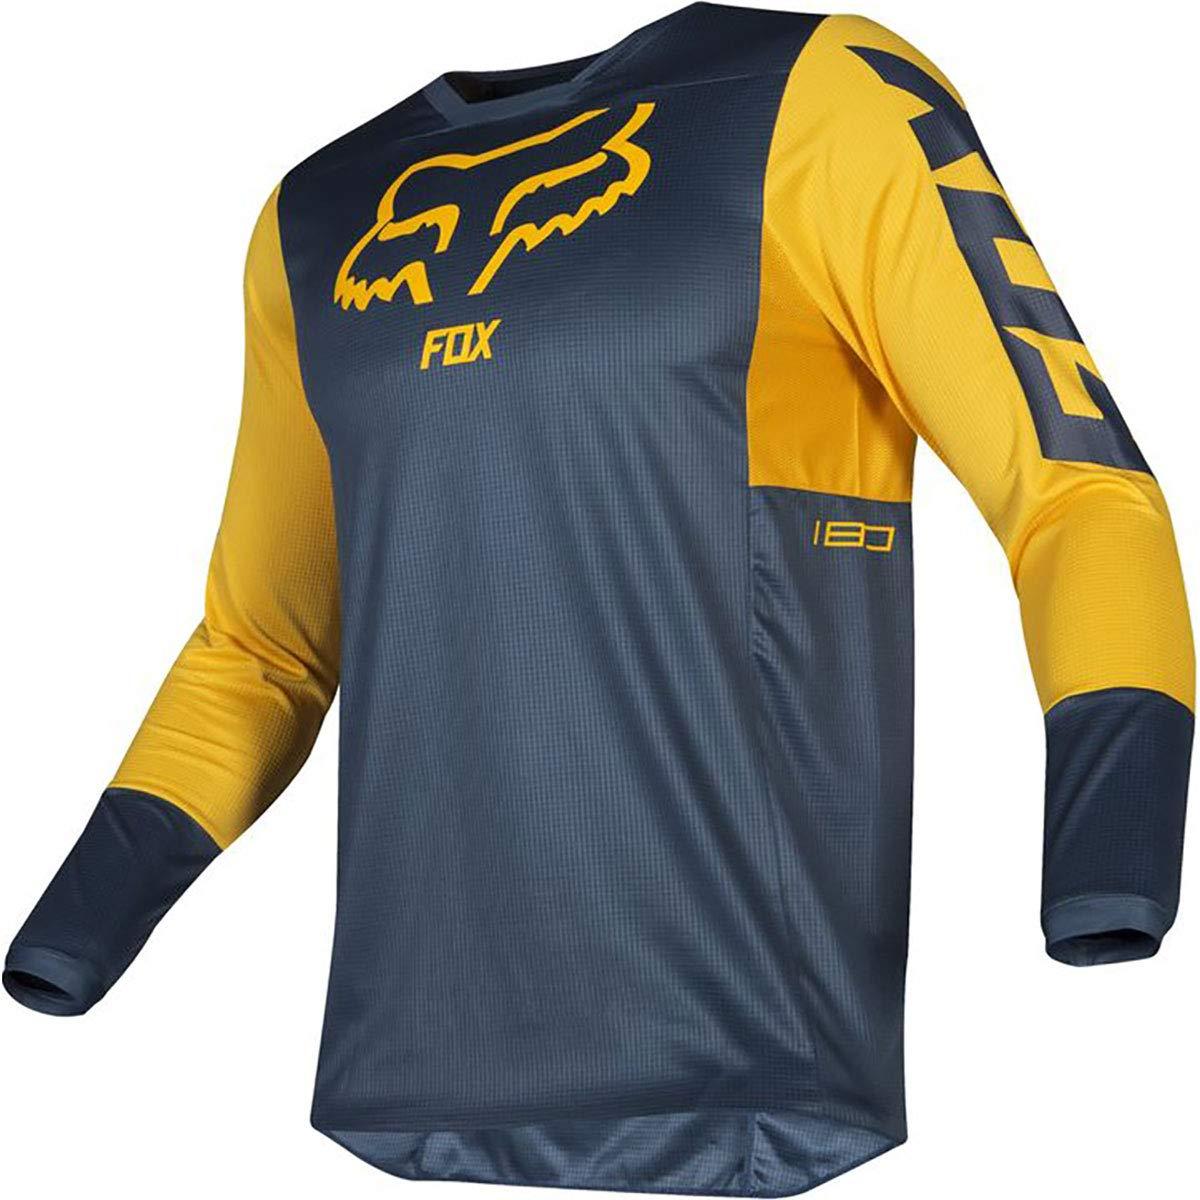 Fox Racing 2019 180 Przm Jersey-Navy/Yellow-XL